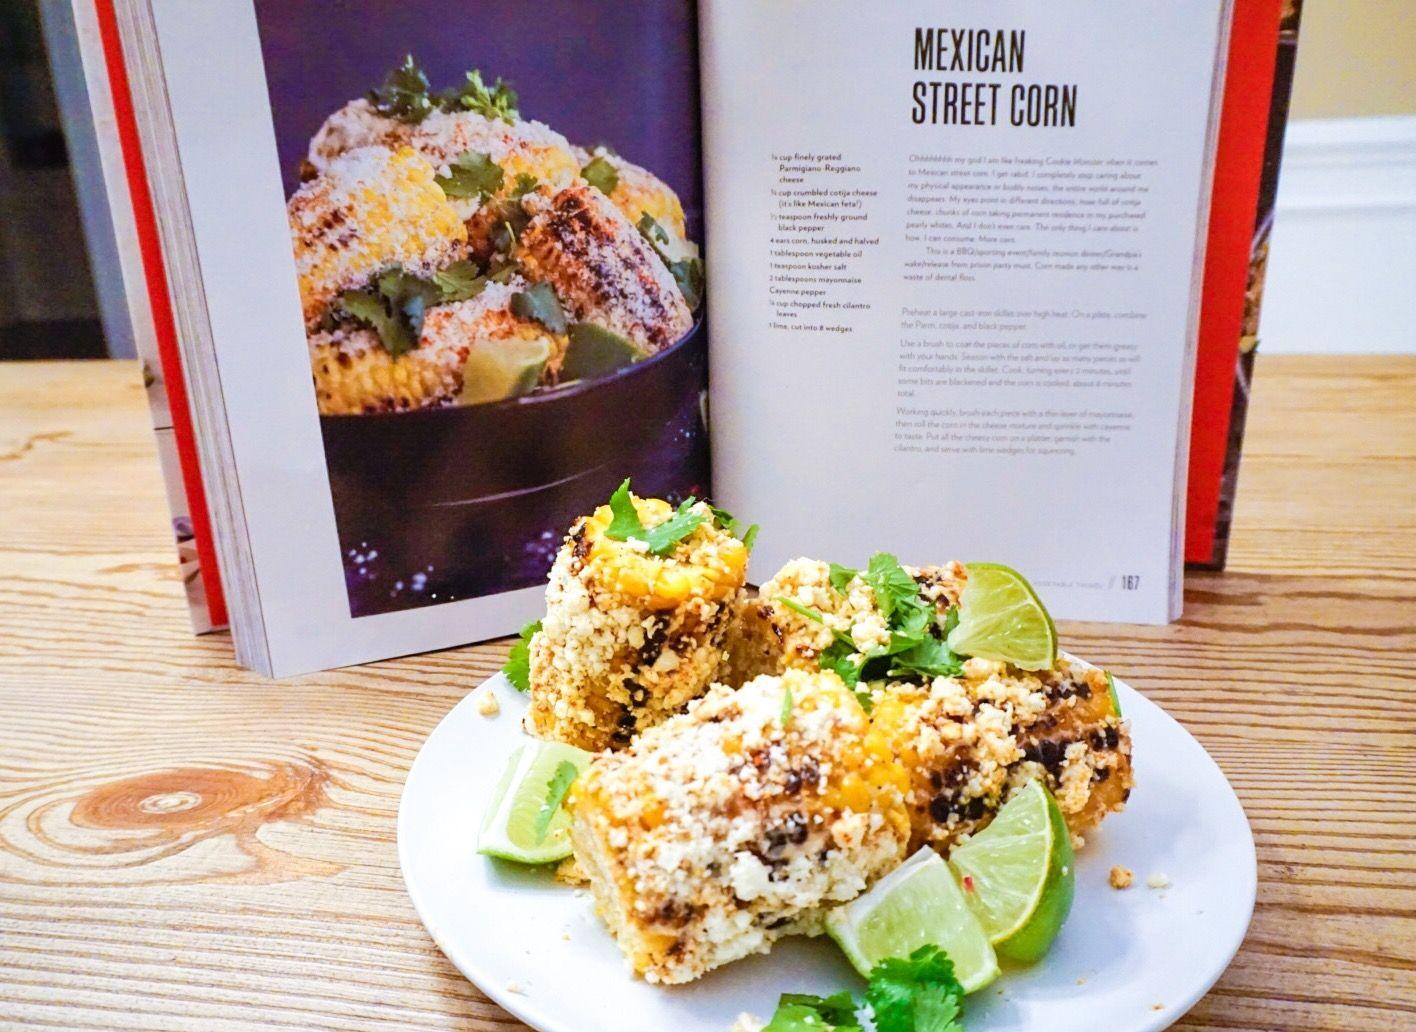 The perfect mexican street corn for cinco de mayo chrissy teigen the perfect mexican street corn for cinco de mayo chrissy teigen cravings forumfinder Choice Image